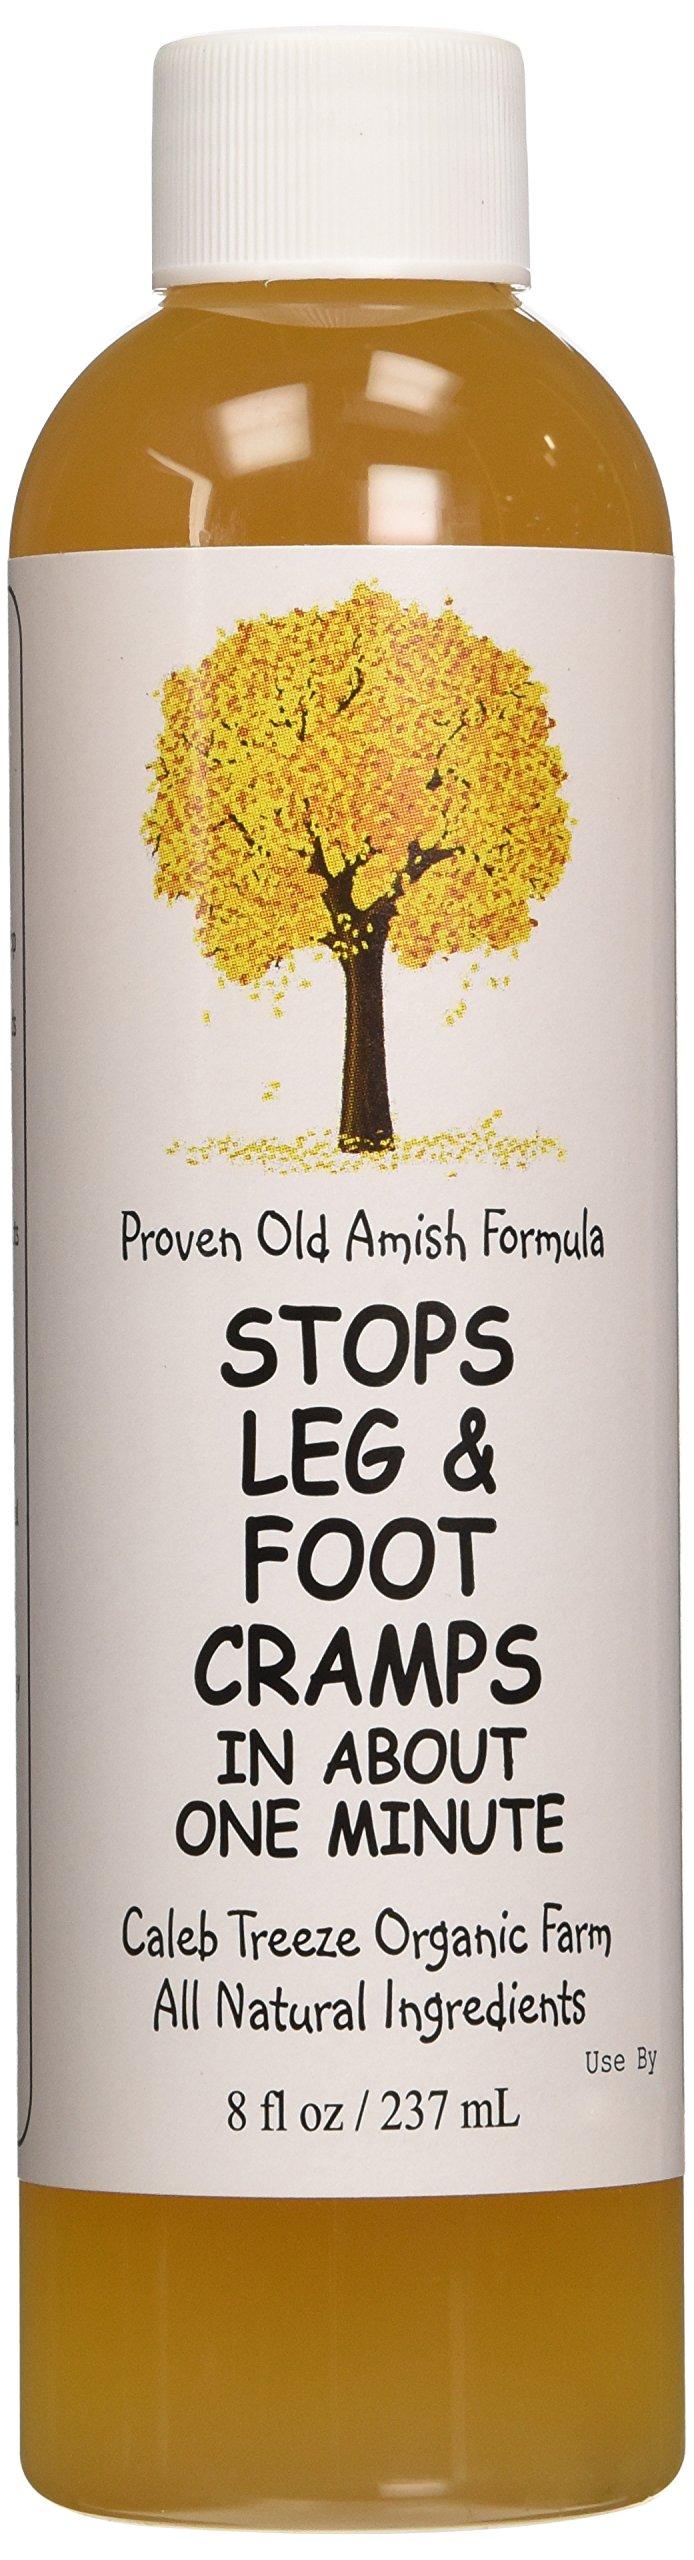 Caleb Treeze Organic Farms Stops Leg & Foot Cramps by Caleb Treeze